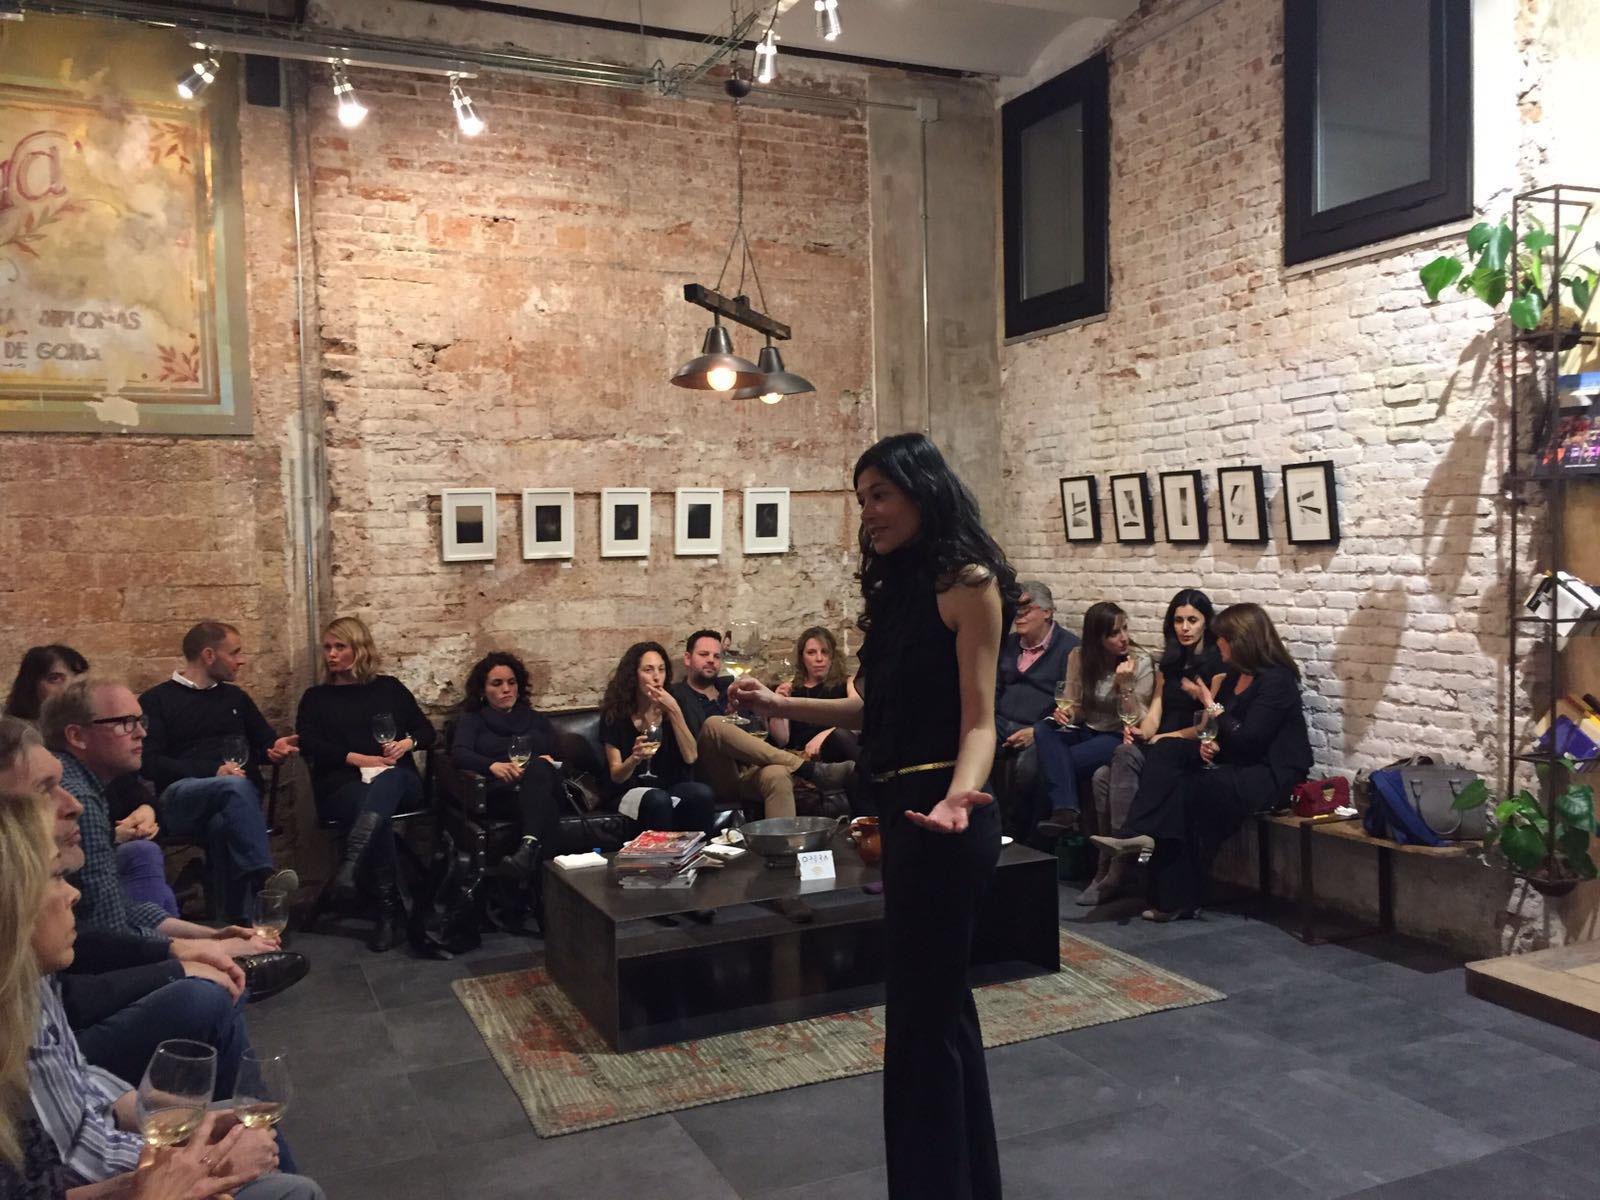 opera_lounge_barcelona_tasting_marzo_2016_img_8.jpg